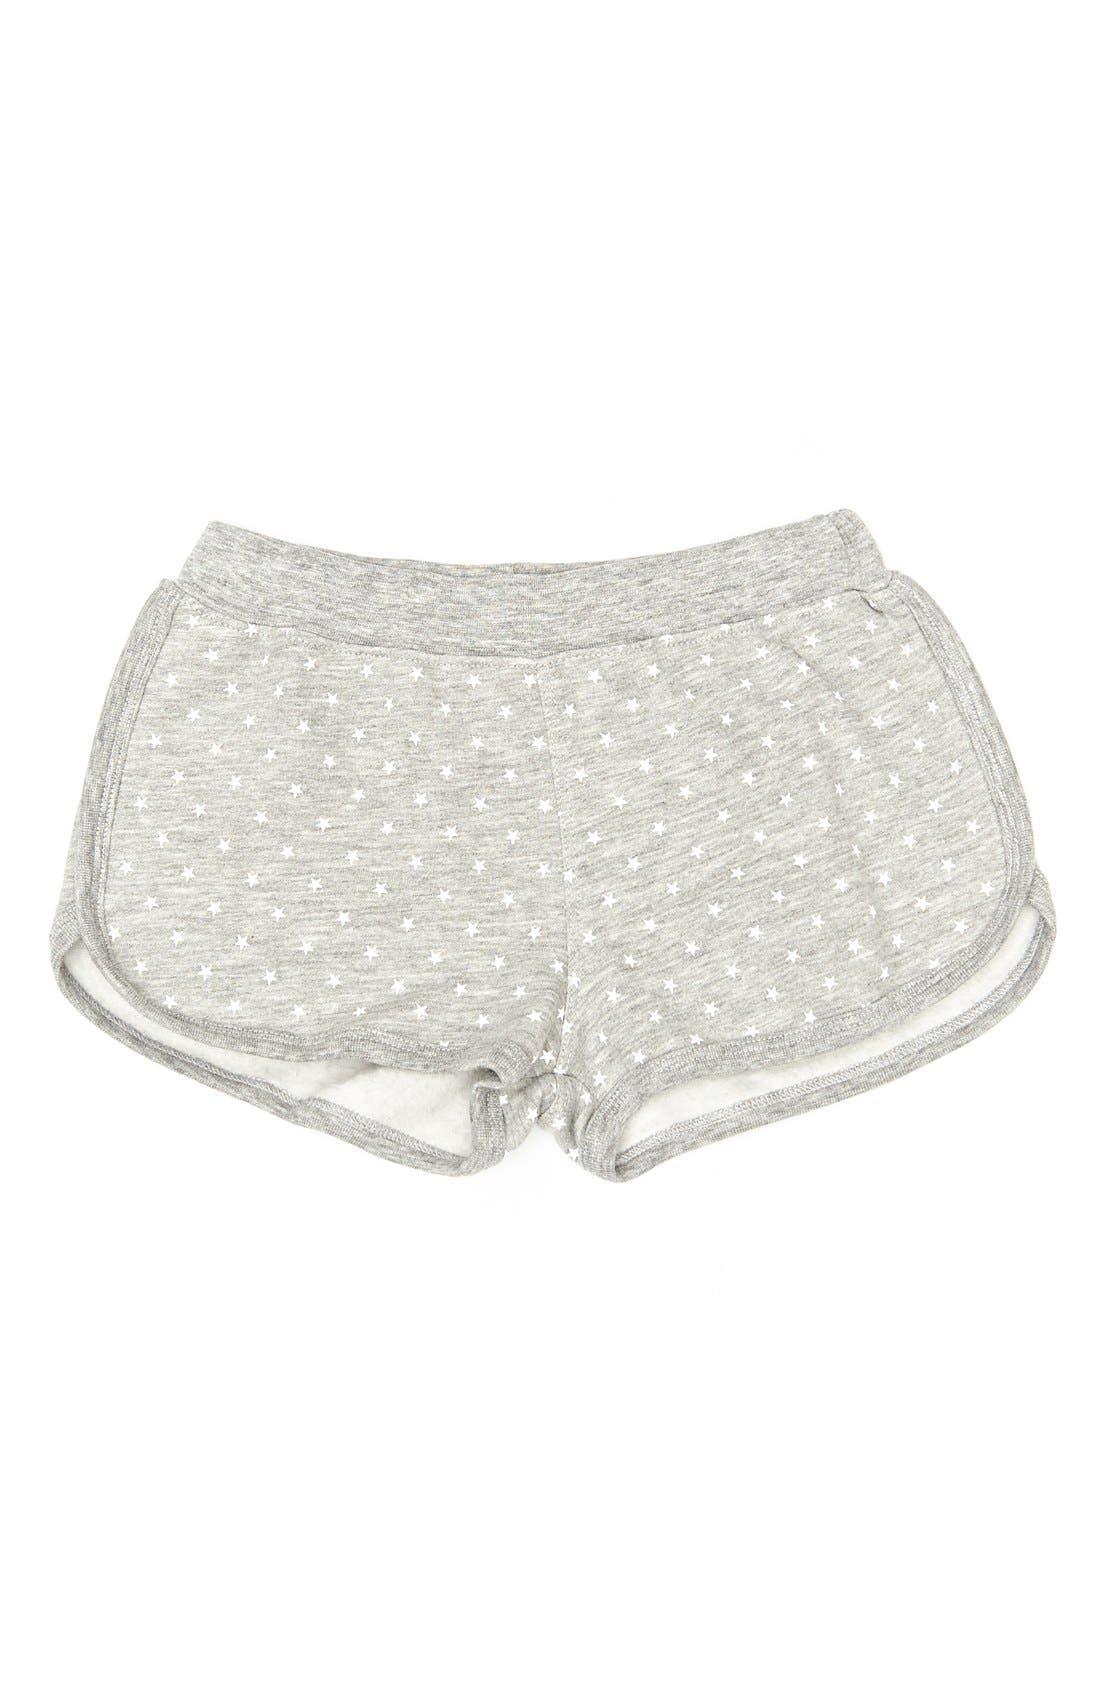 Main Image - Peek 'Mimi' Star Print Dolphin Shorts (Toddler Girls, Little Girls & Big Girls)